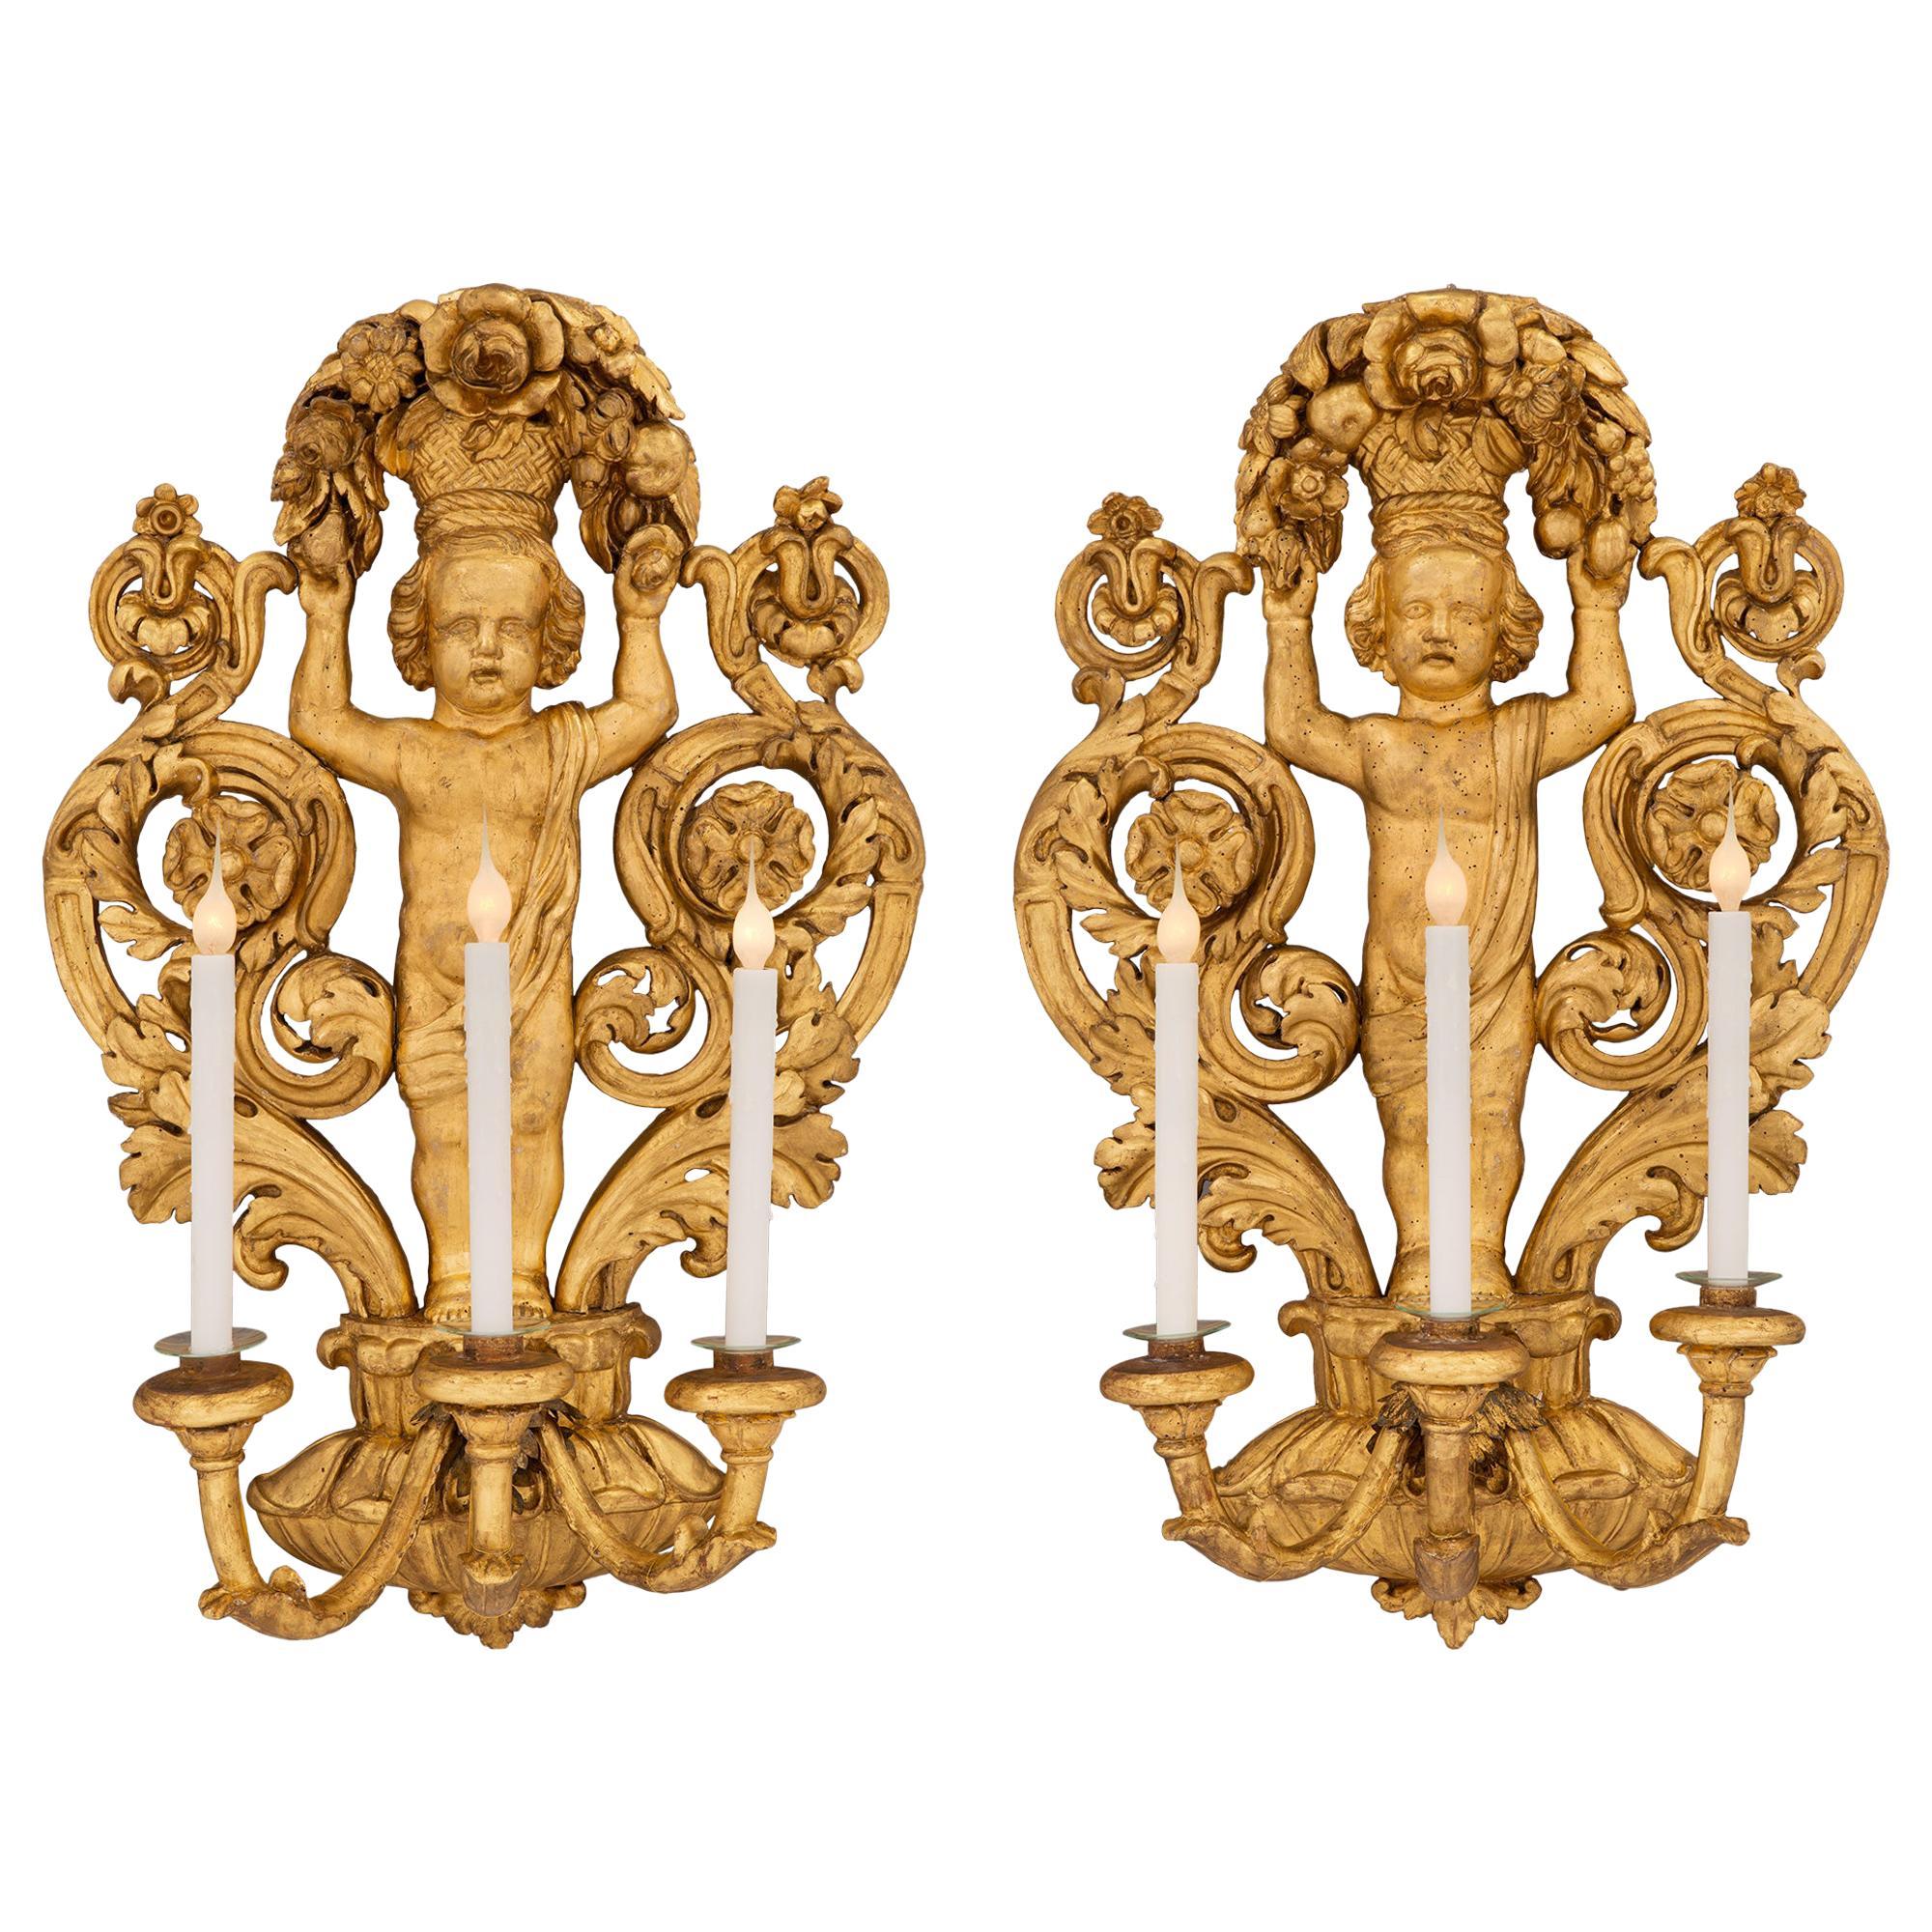 Pair of Italian 18th Century Baroque Period Giltwood Three-Arm Sconces